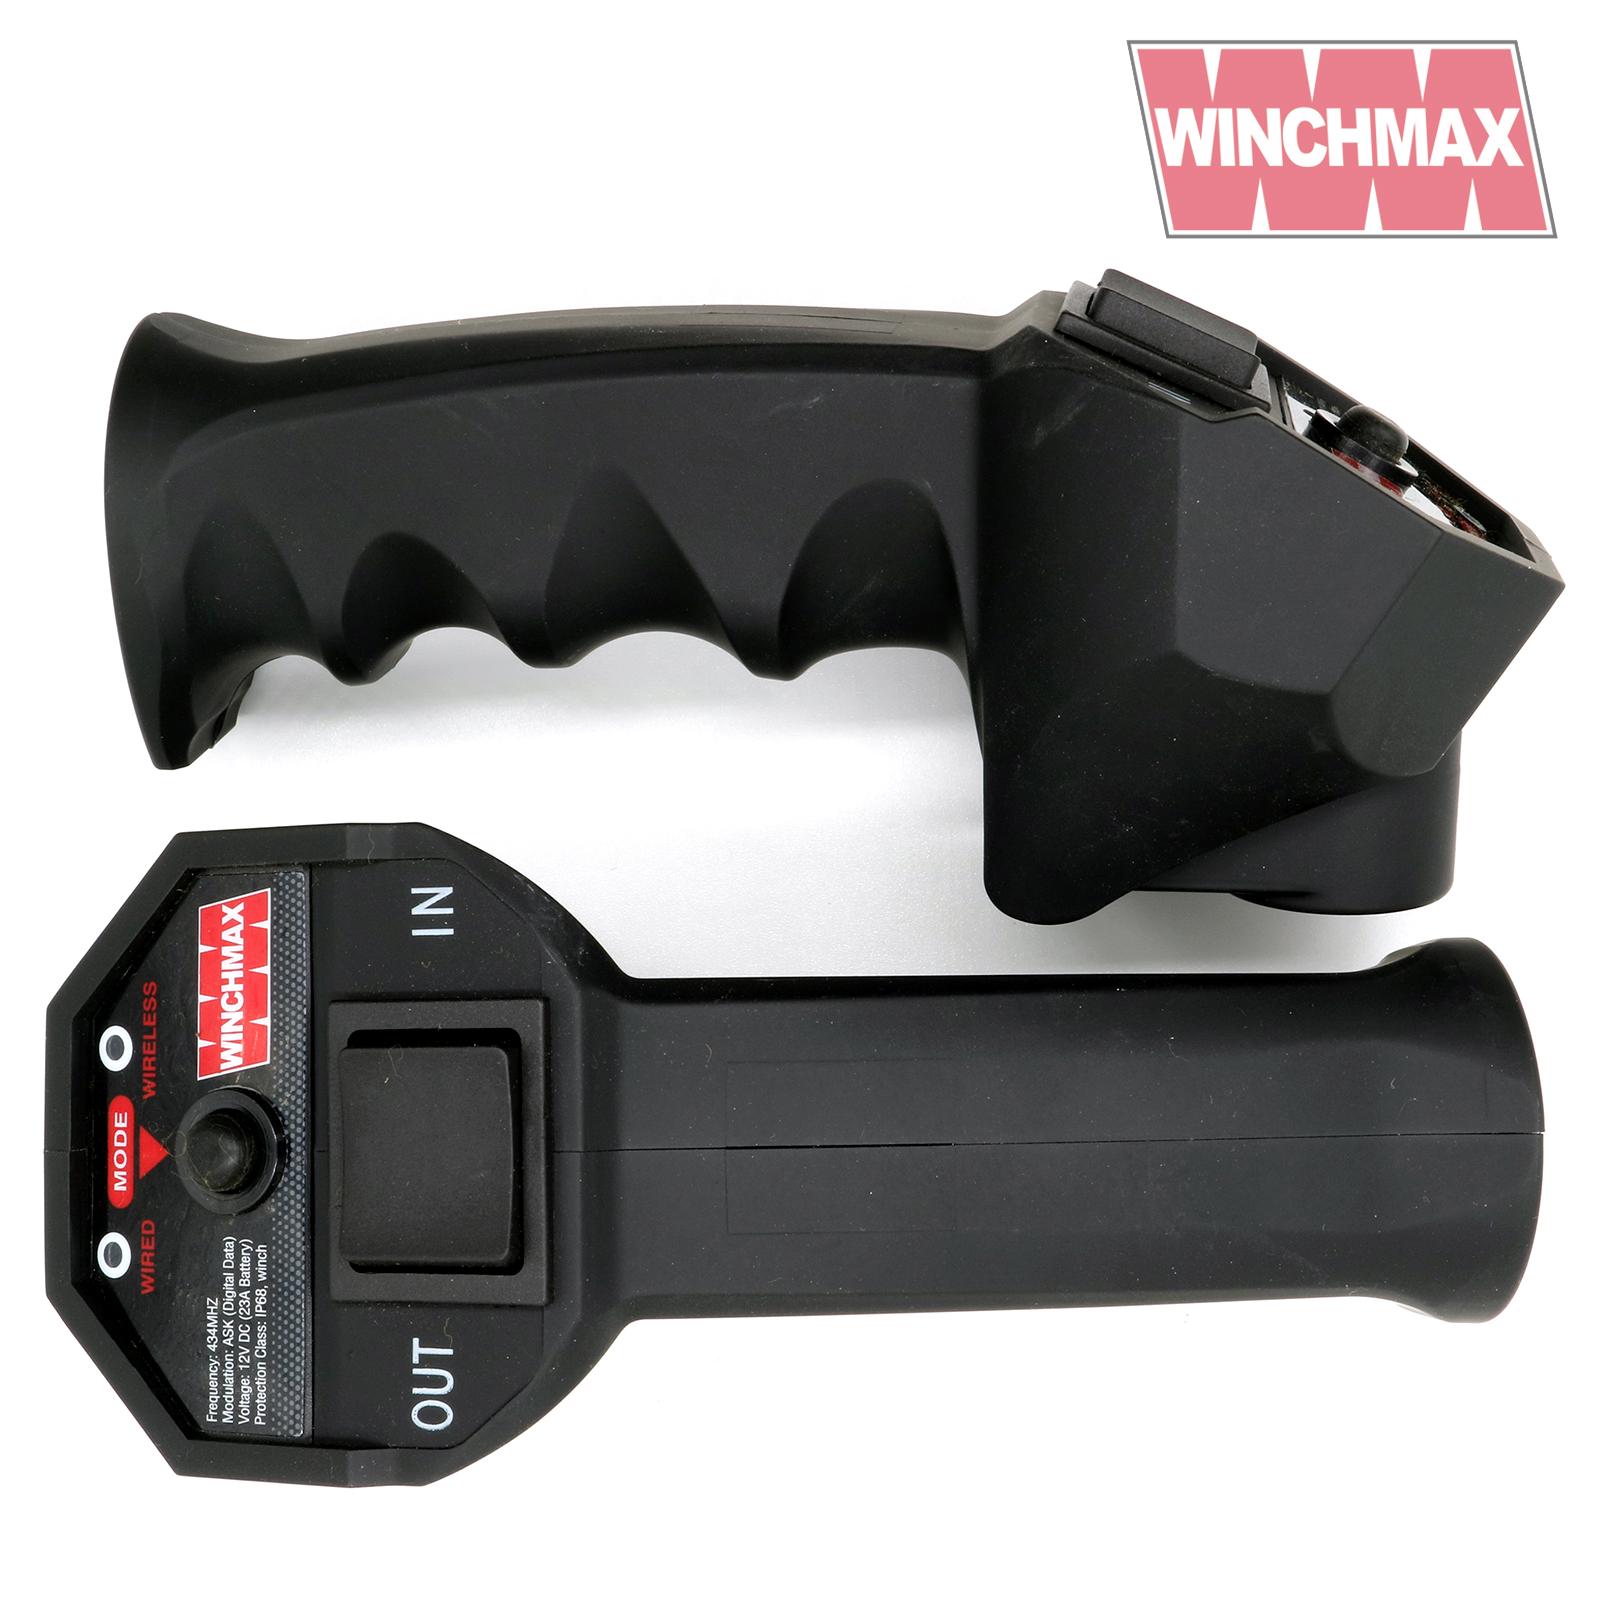 Wmcboxsl1350012v d